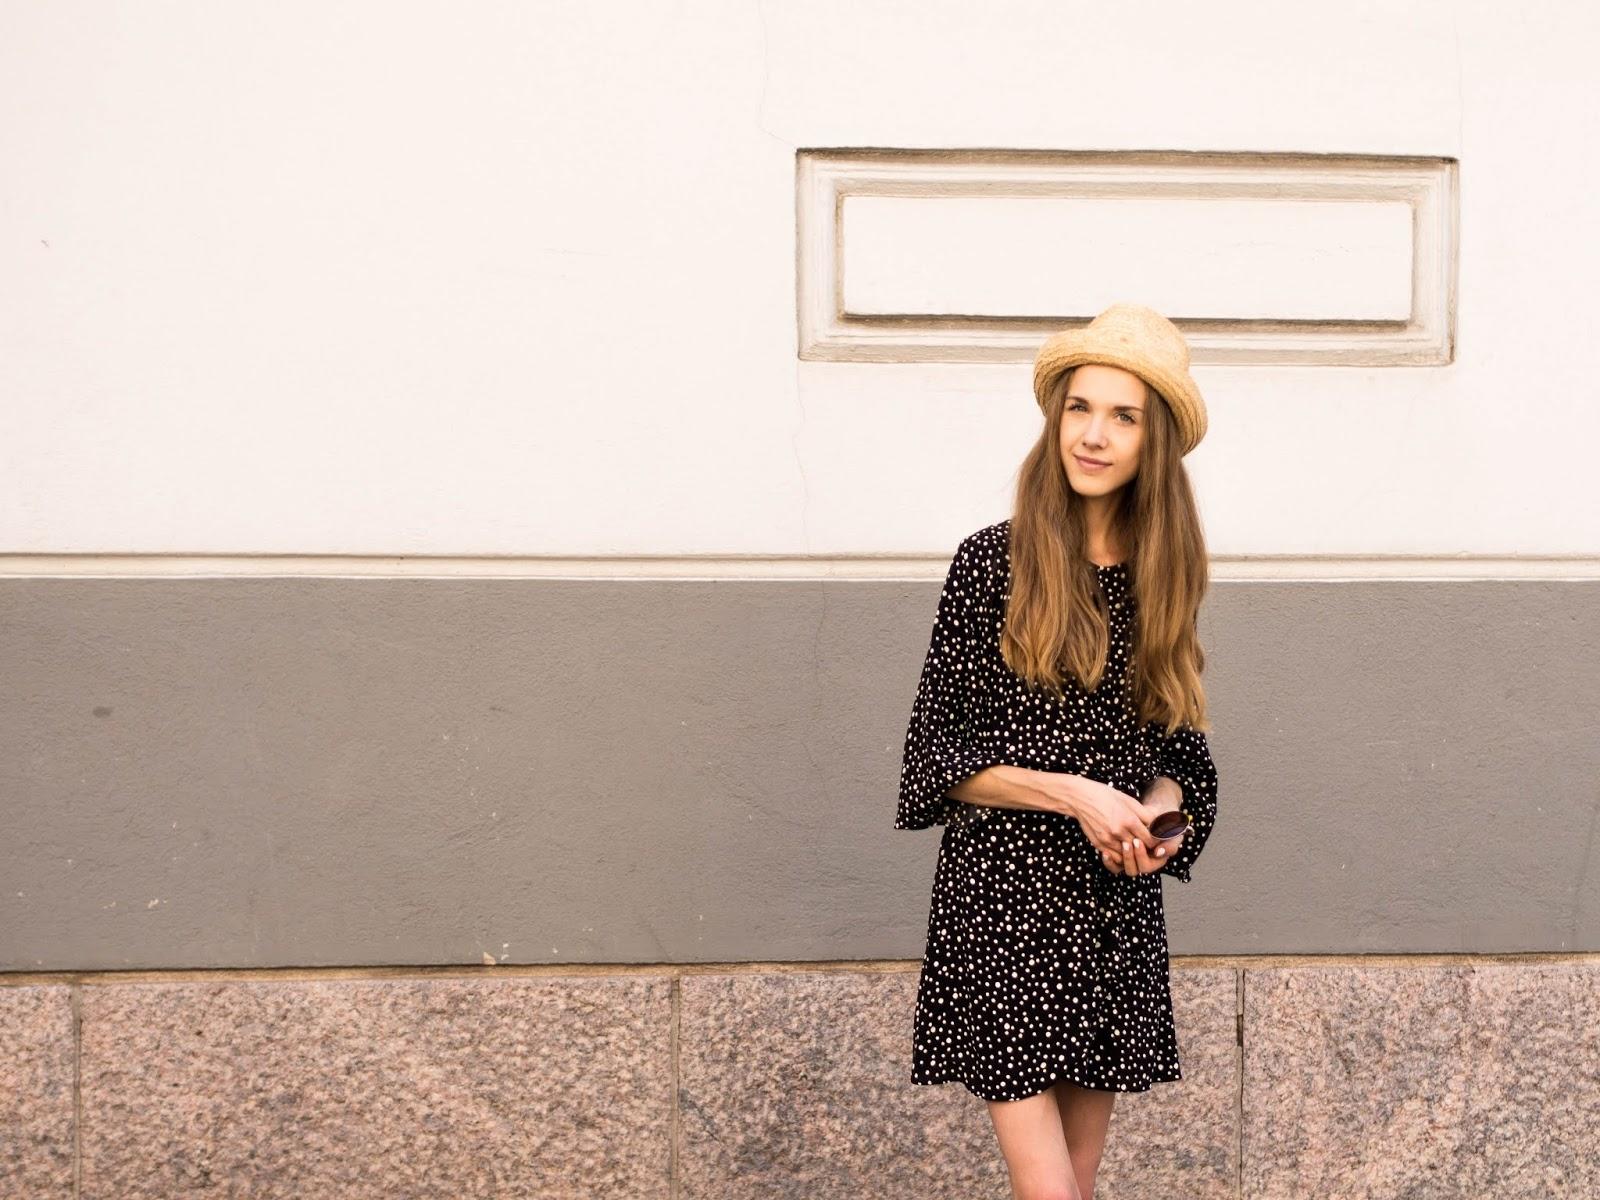 fashion-blogger-summer-outfit-polka-dot-dress